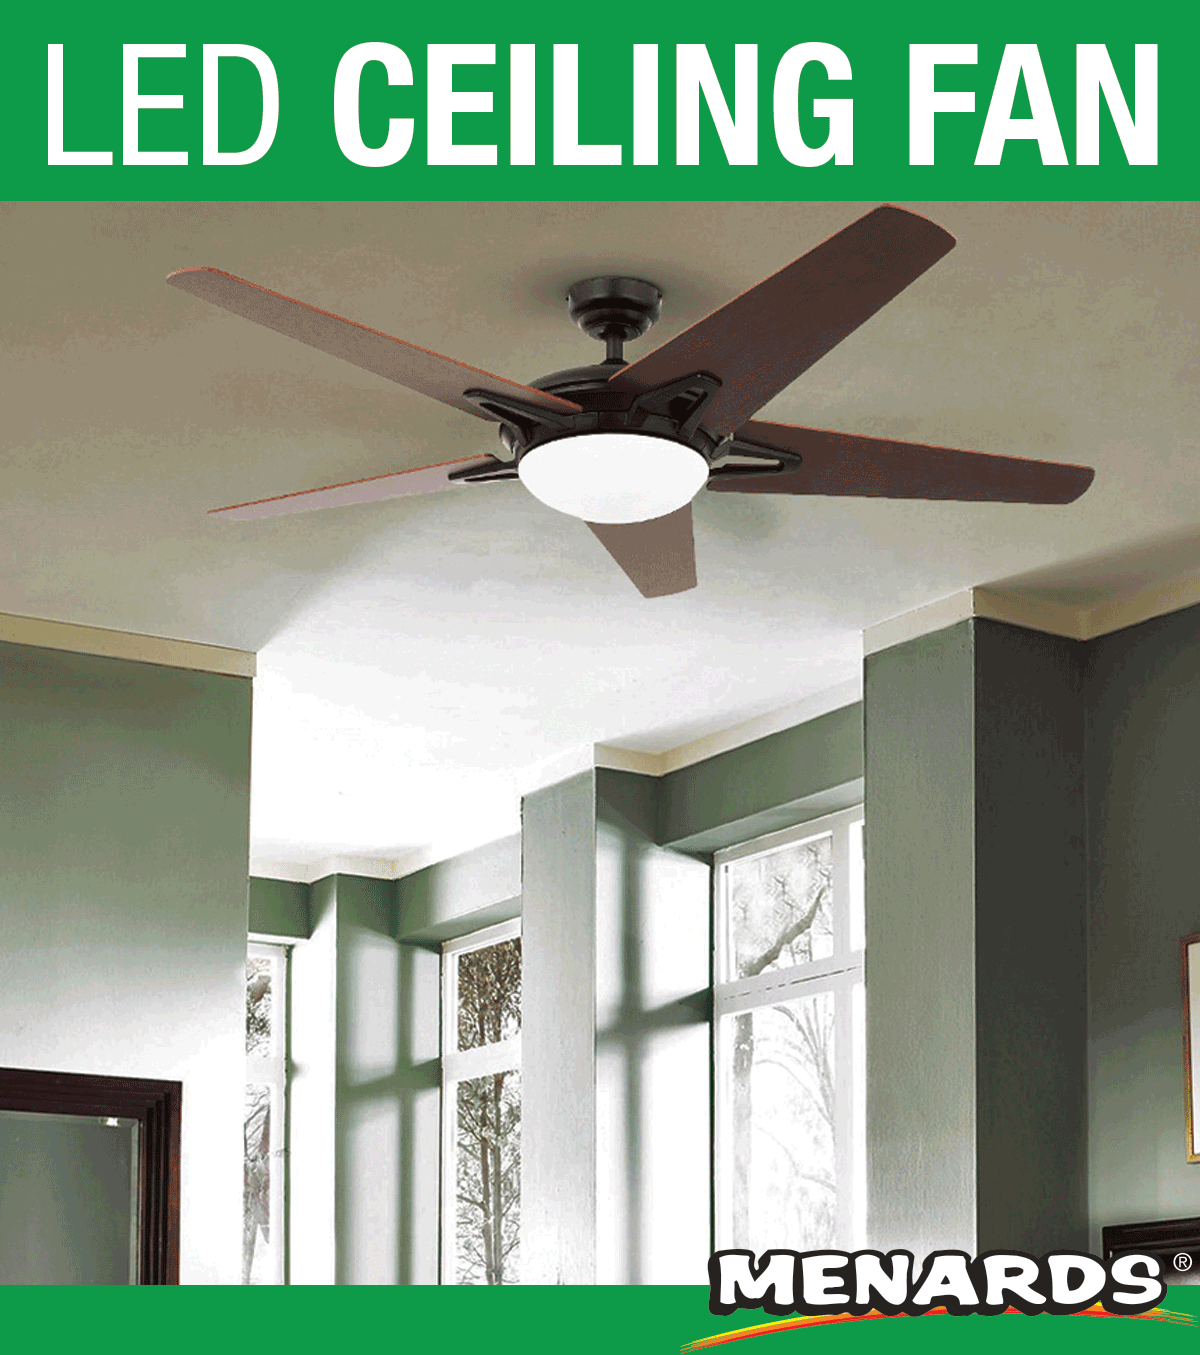 Patriot Lighting Midori Ii 52 Oil Rubbed Bronze Led Ceiling Fan In 2020 Ceiling Fan Led Ceiling Fan Contemporary Fan